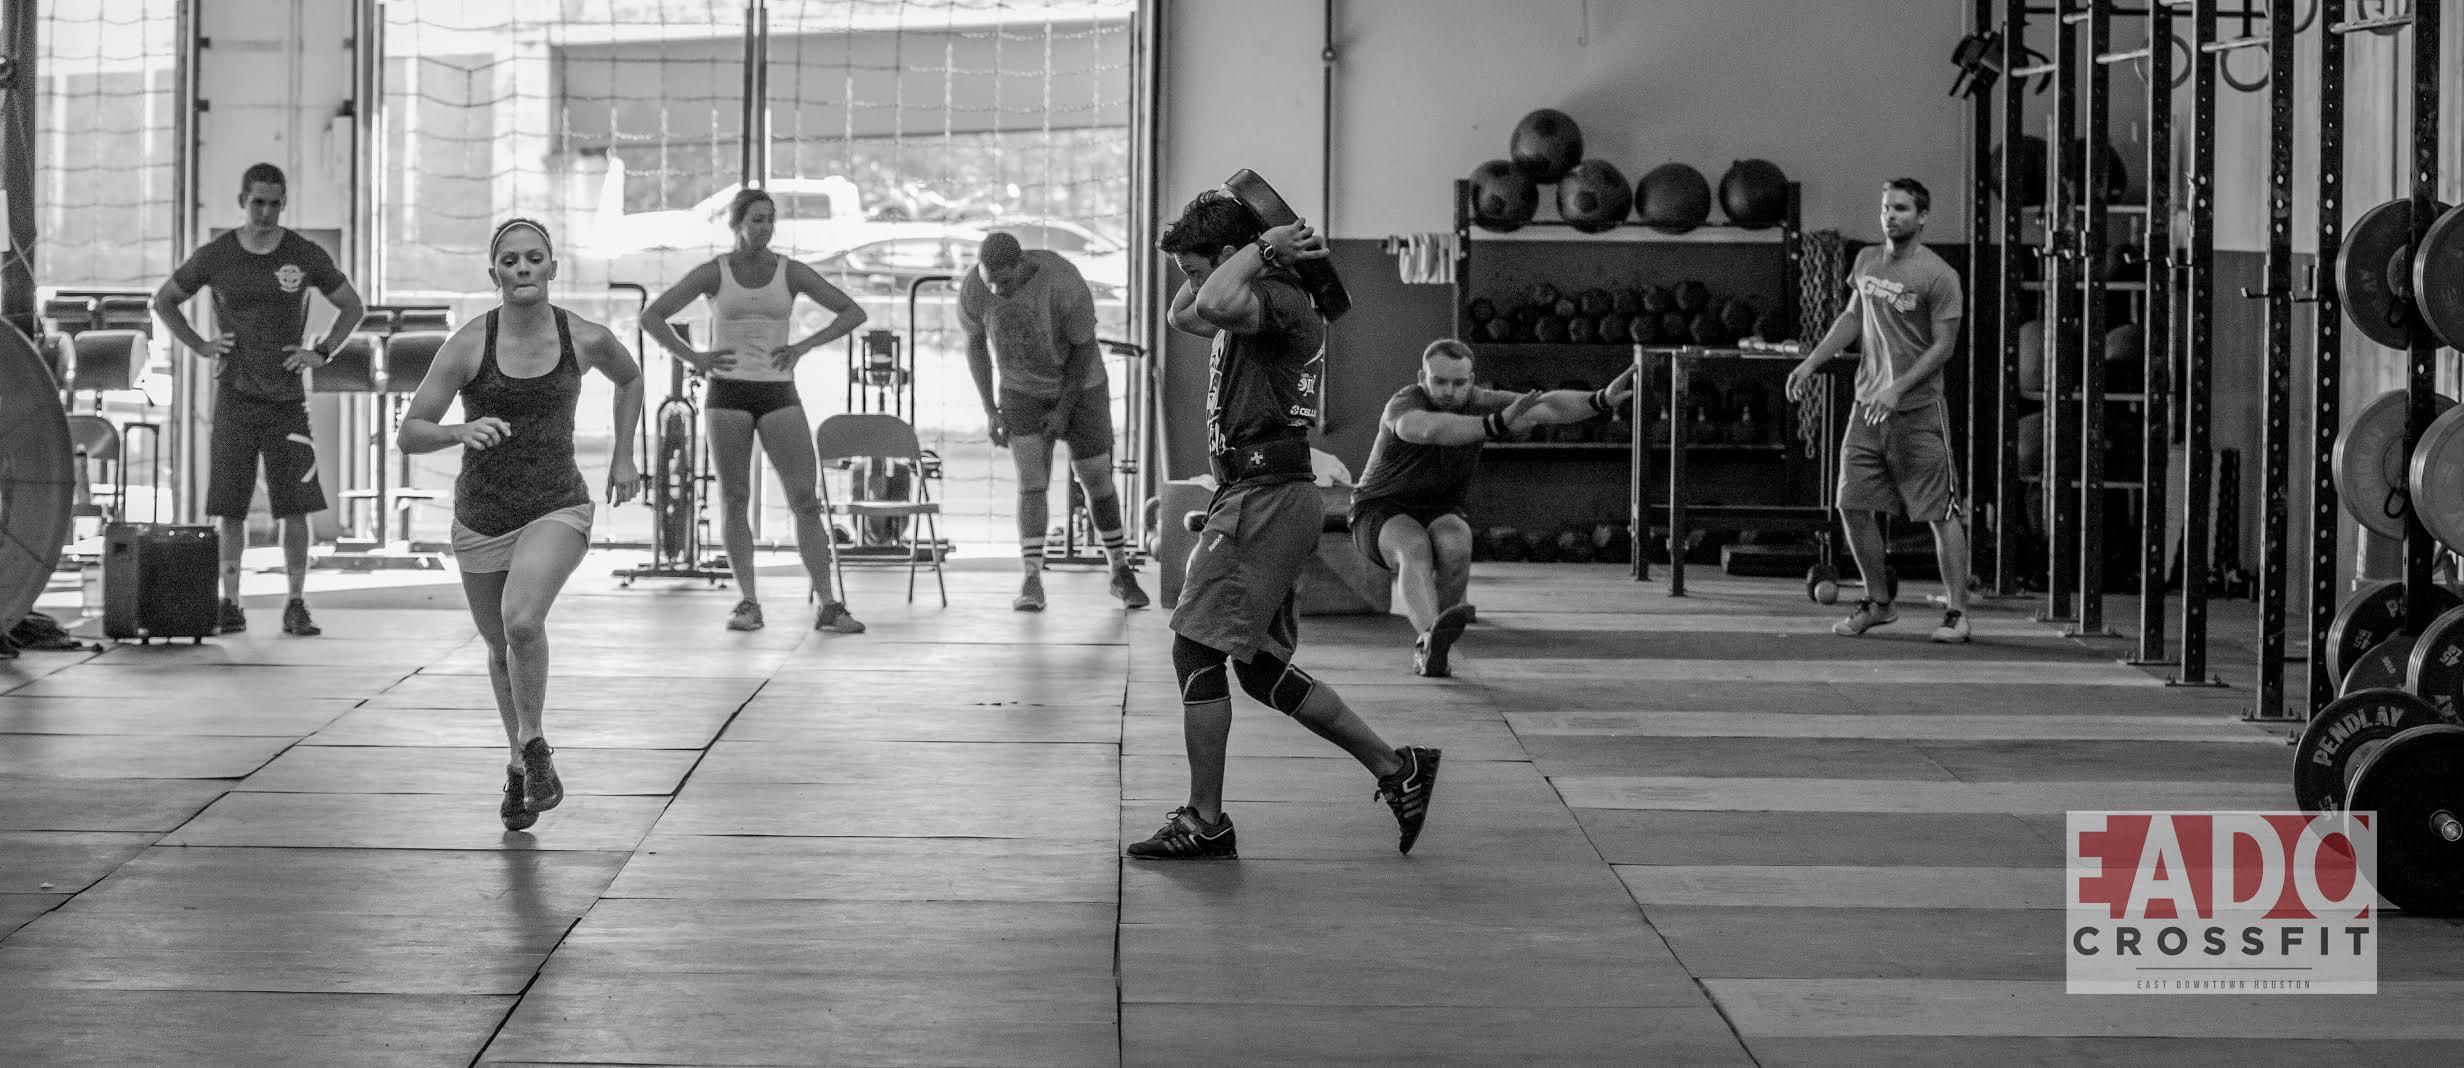 EaDo Elite Athletes during a recent 4:30 training session.  Photo Credit:  Sierra Prime